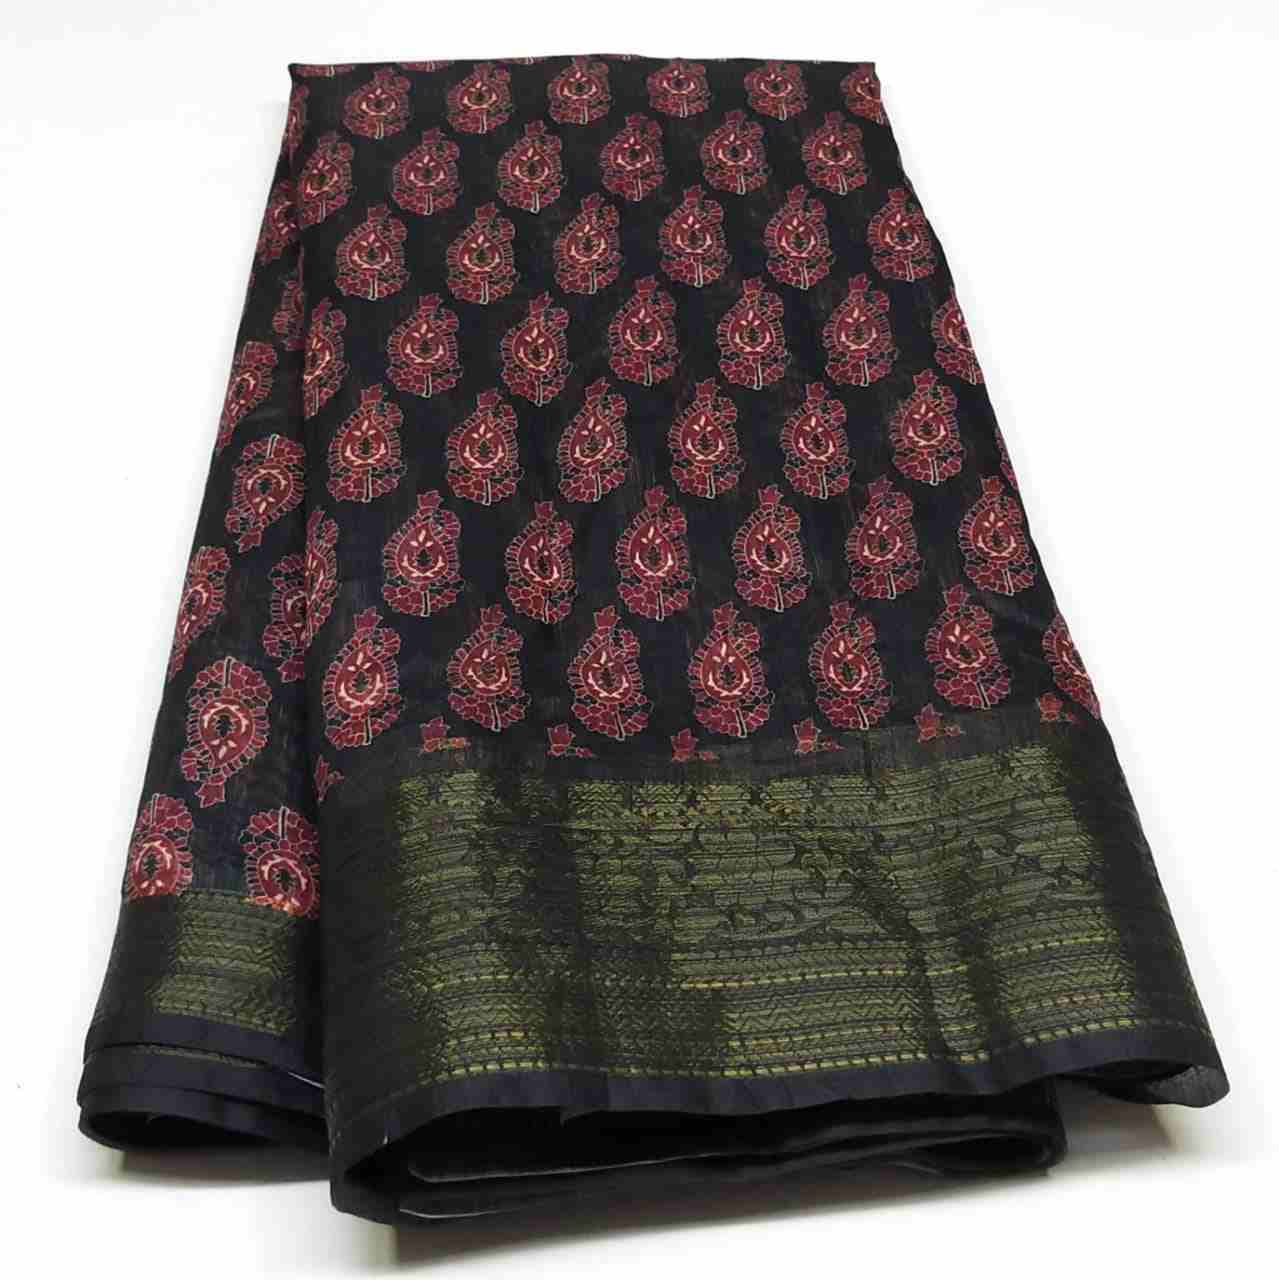 Rambha-2 Black With Red Print Cotton Saree